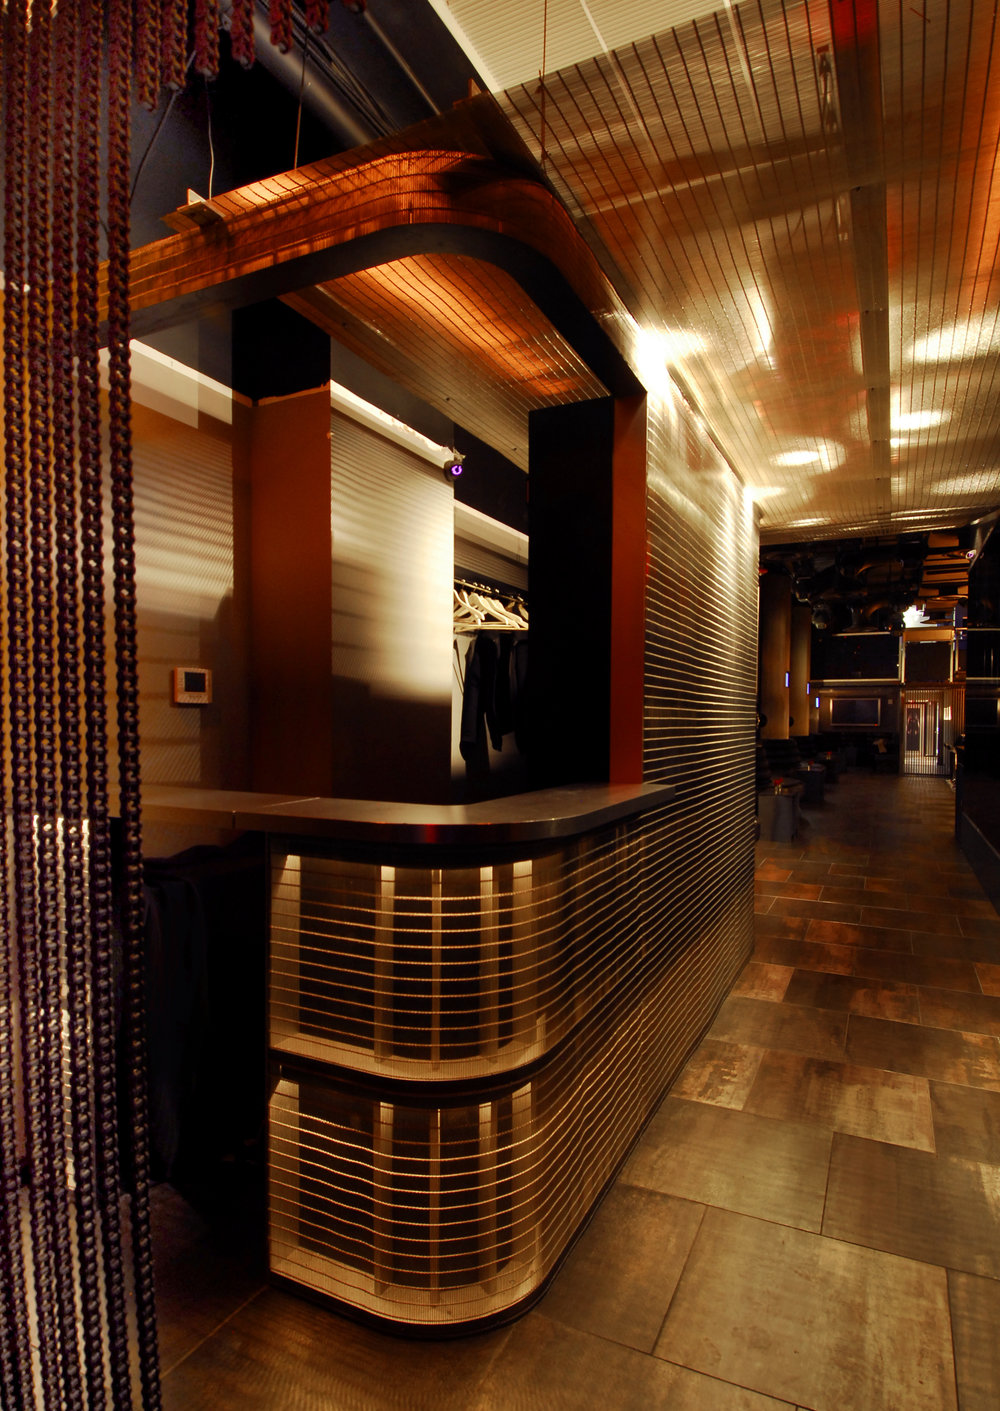 studio-saint-bars-and-restaurants-tattoo-bar-washington-dc-1